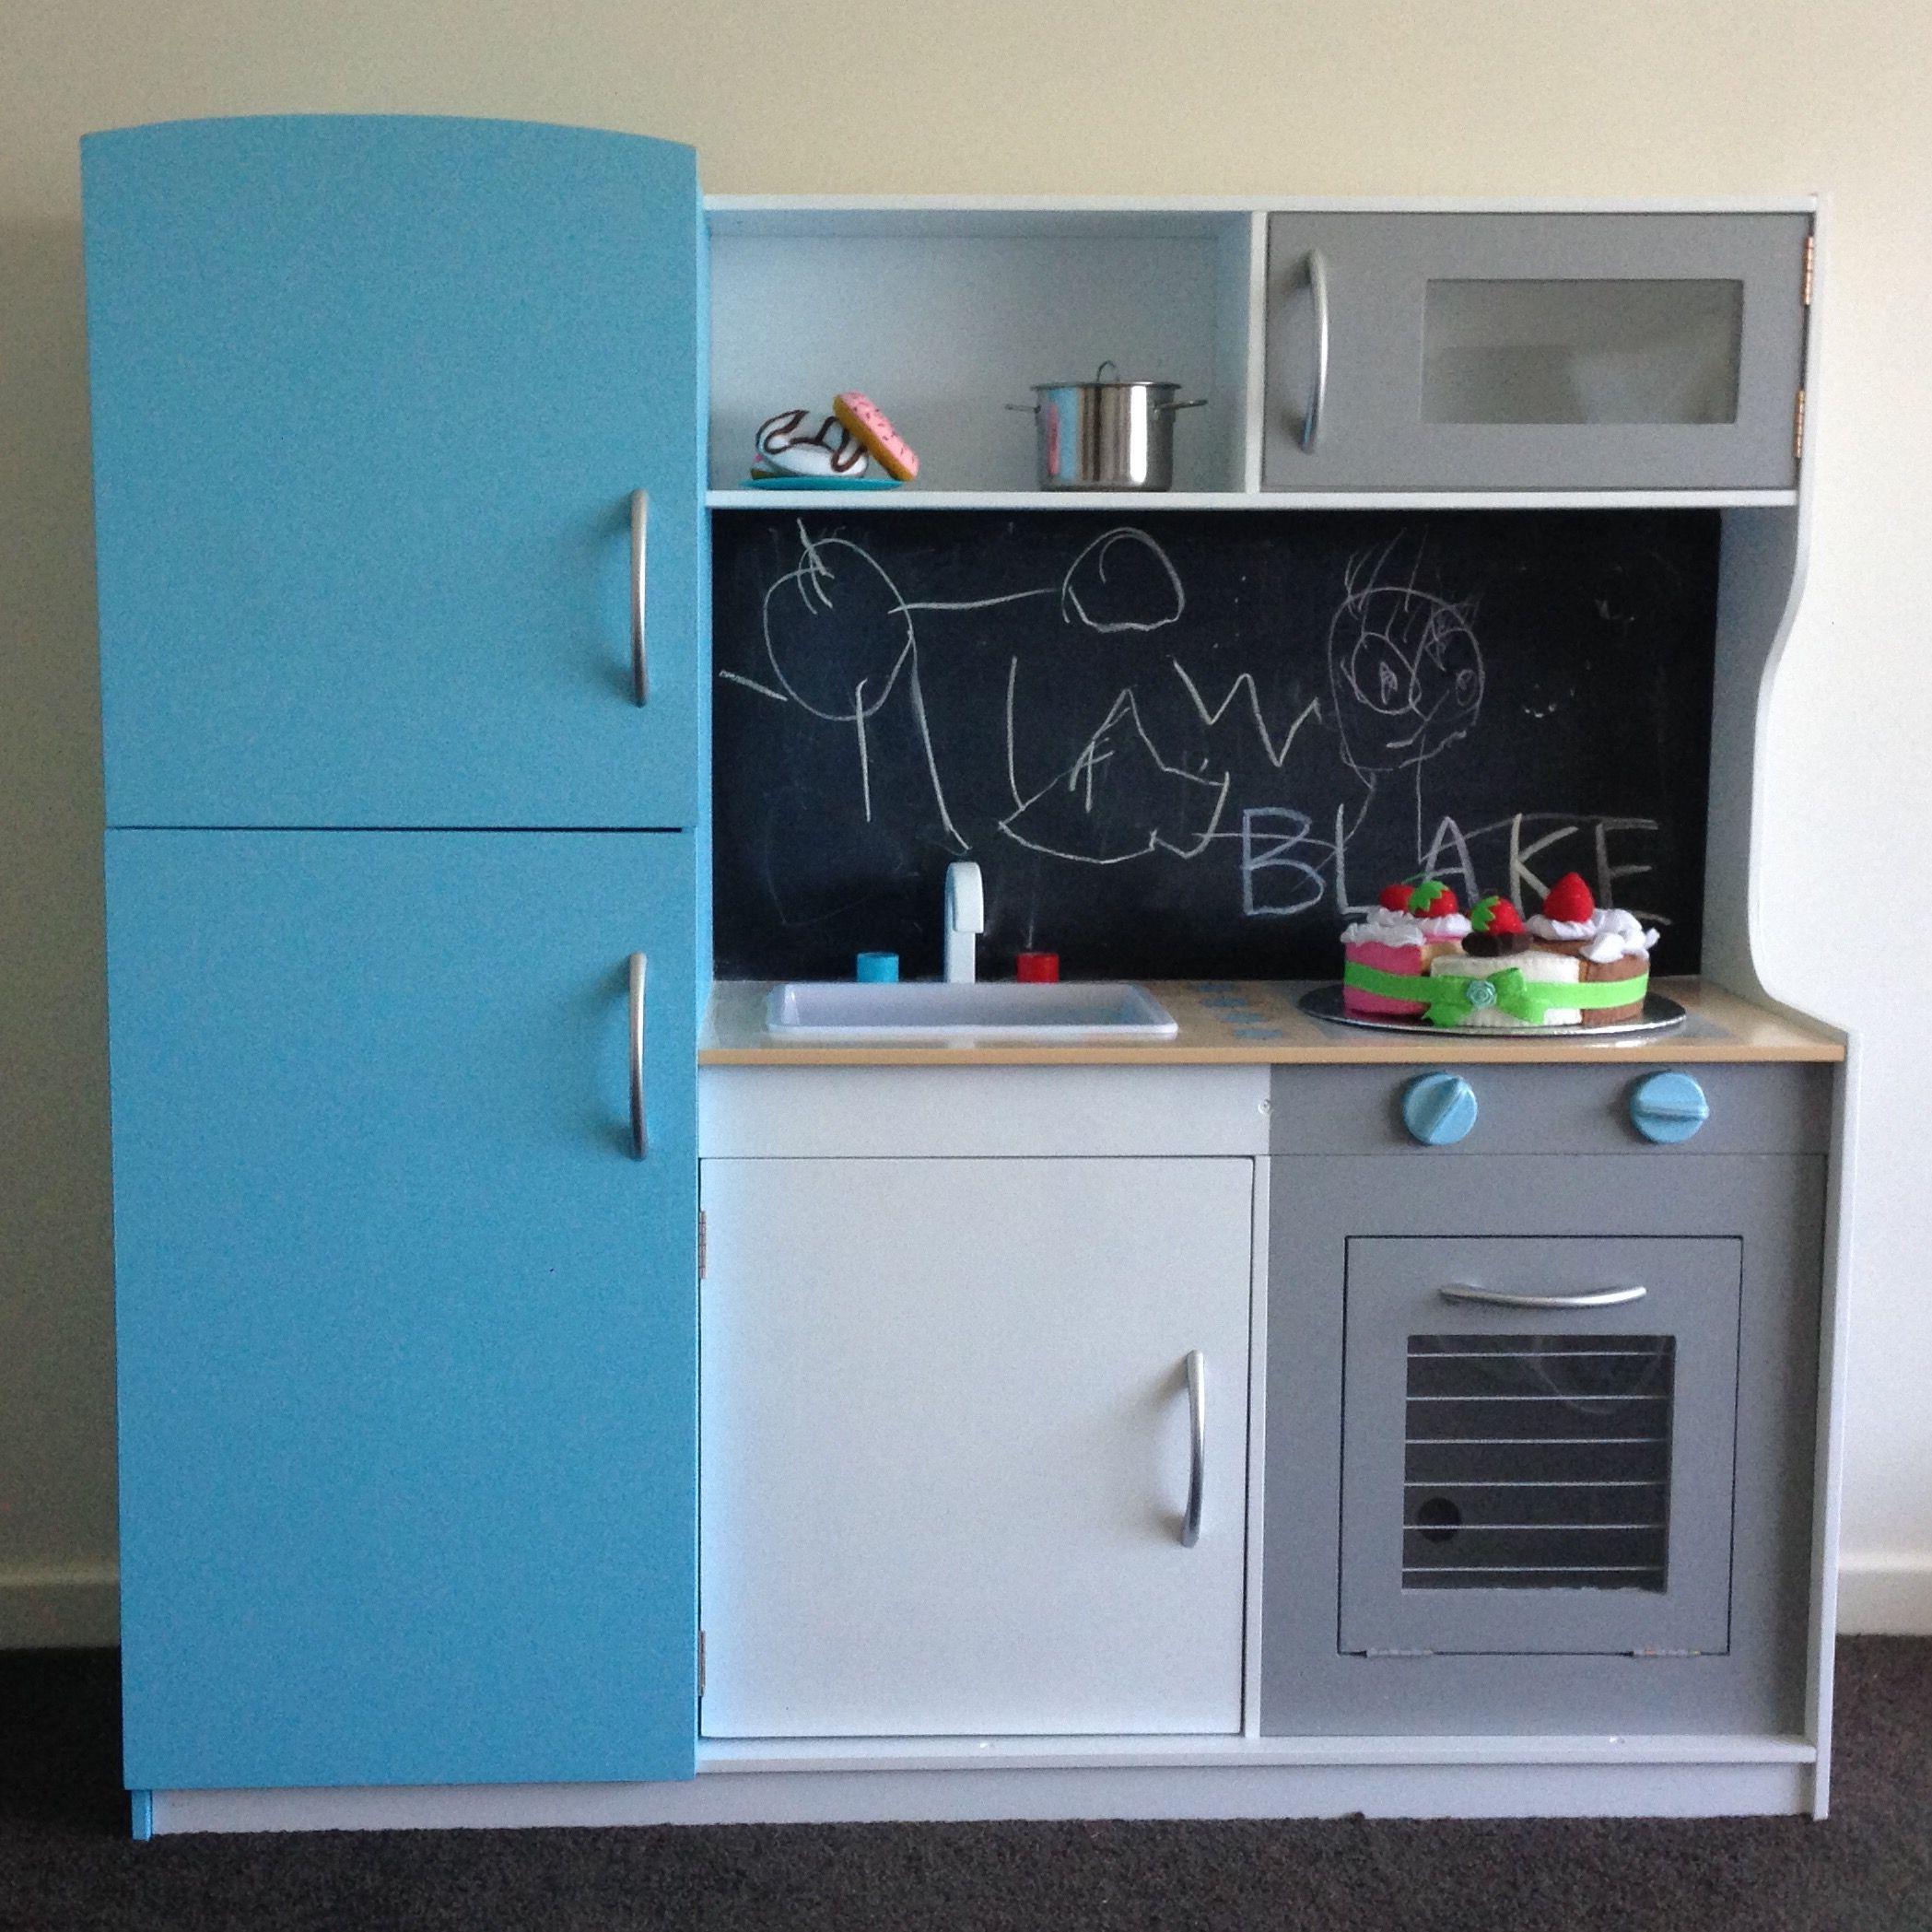 Kmart kids kitchen hack #kmart #kidskitchen #kmarthack #playroom ...